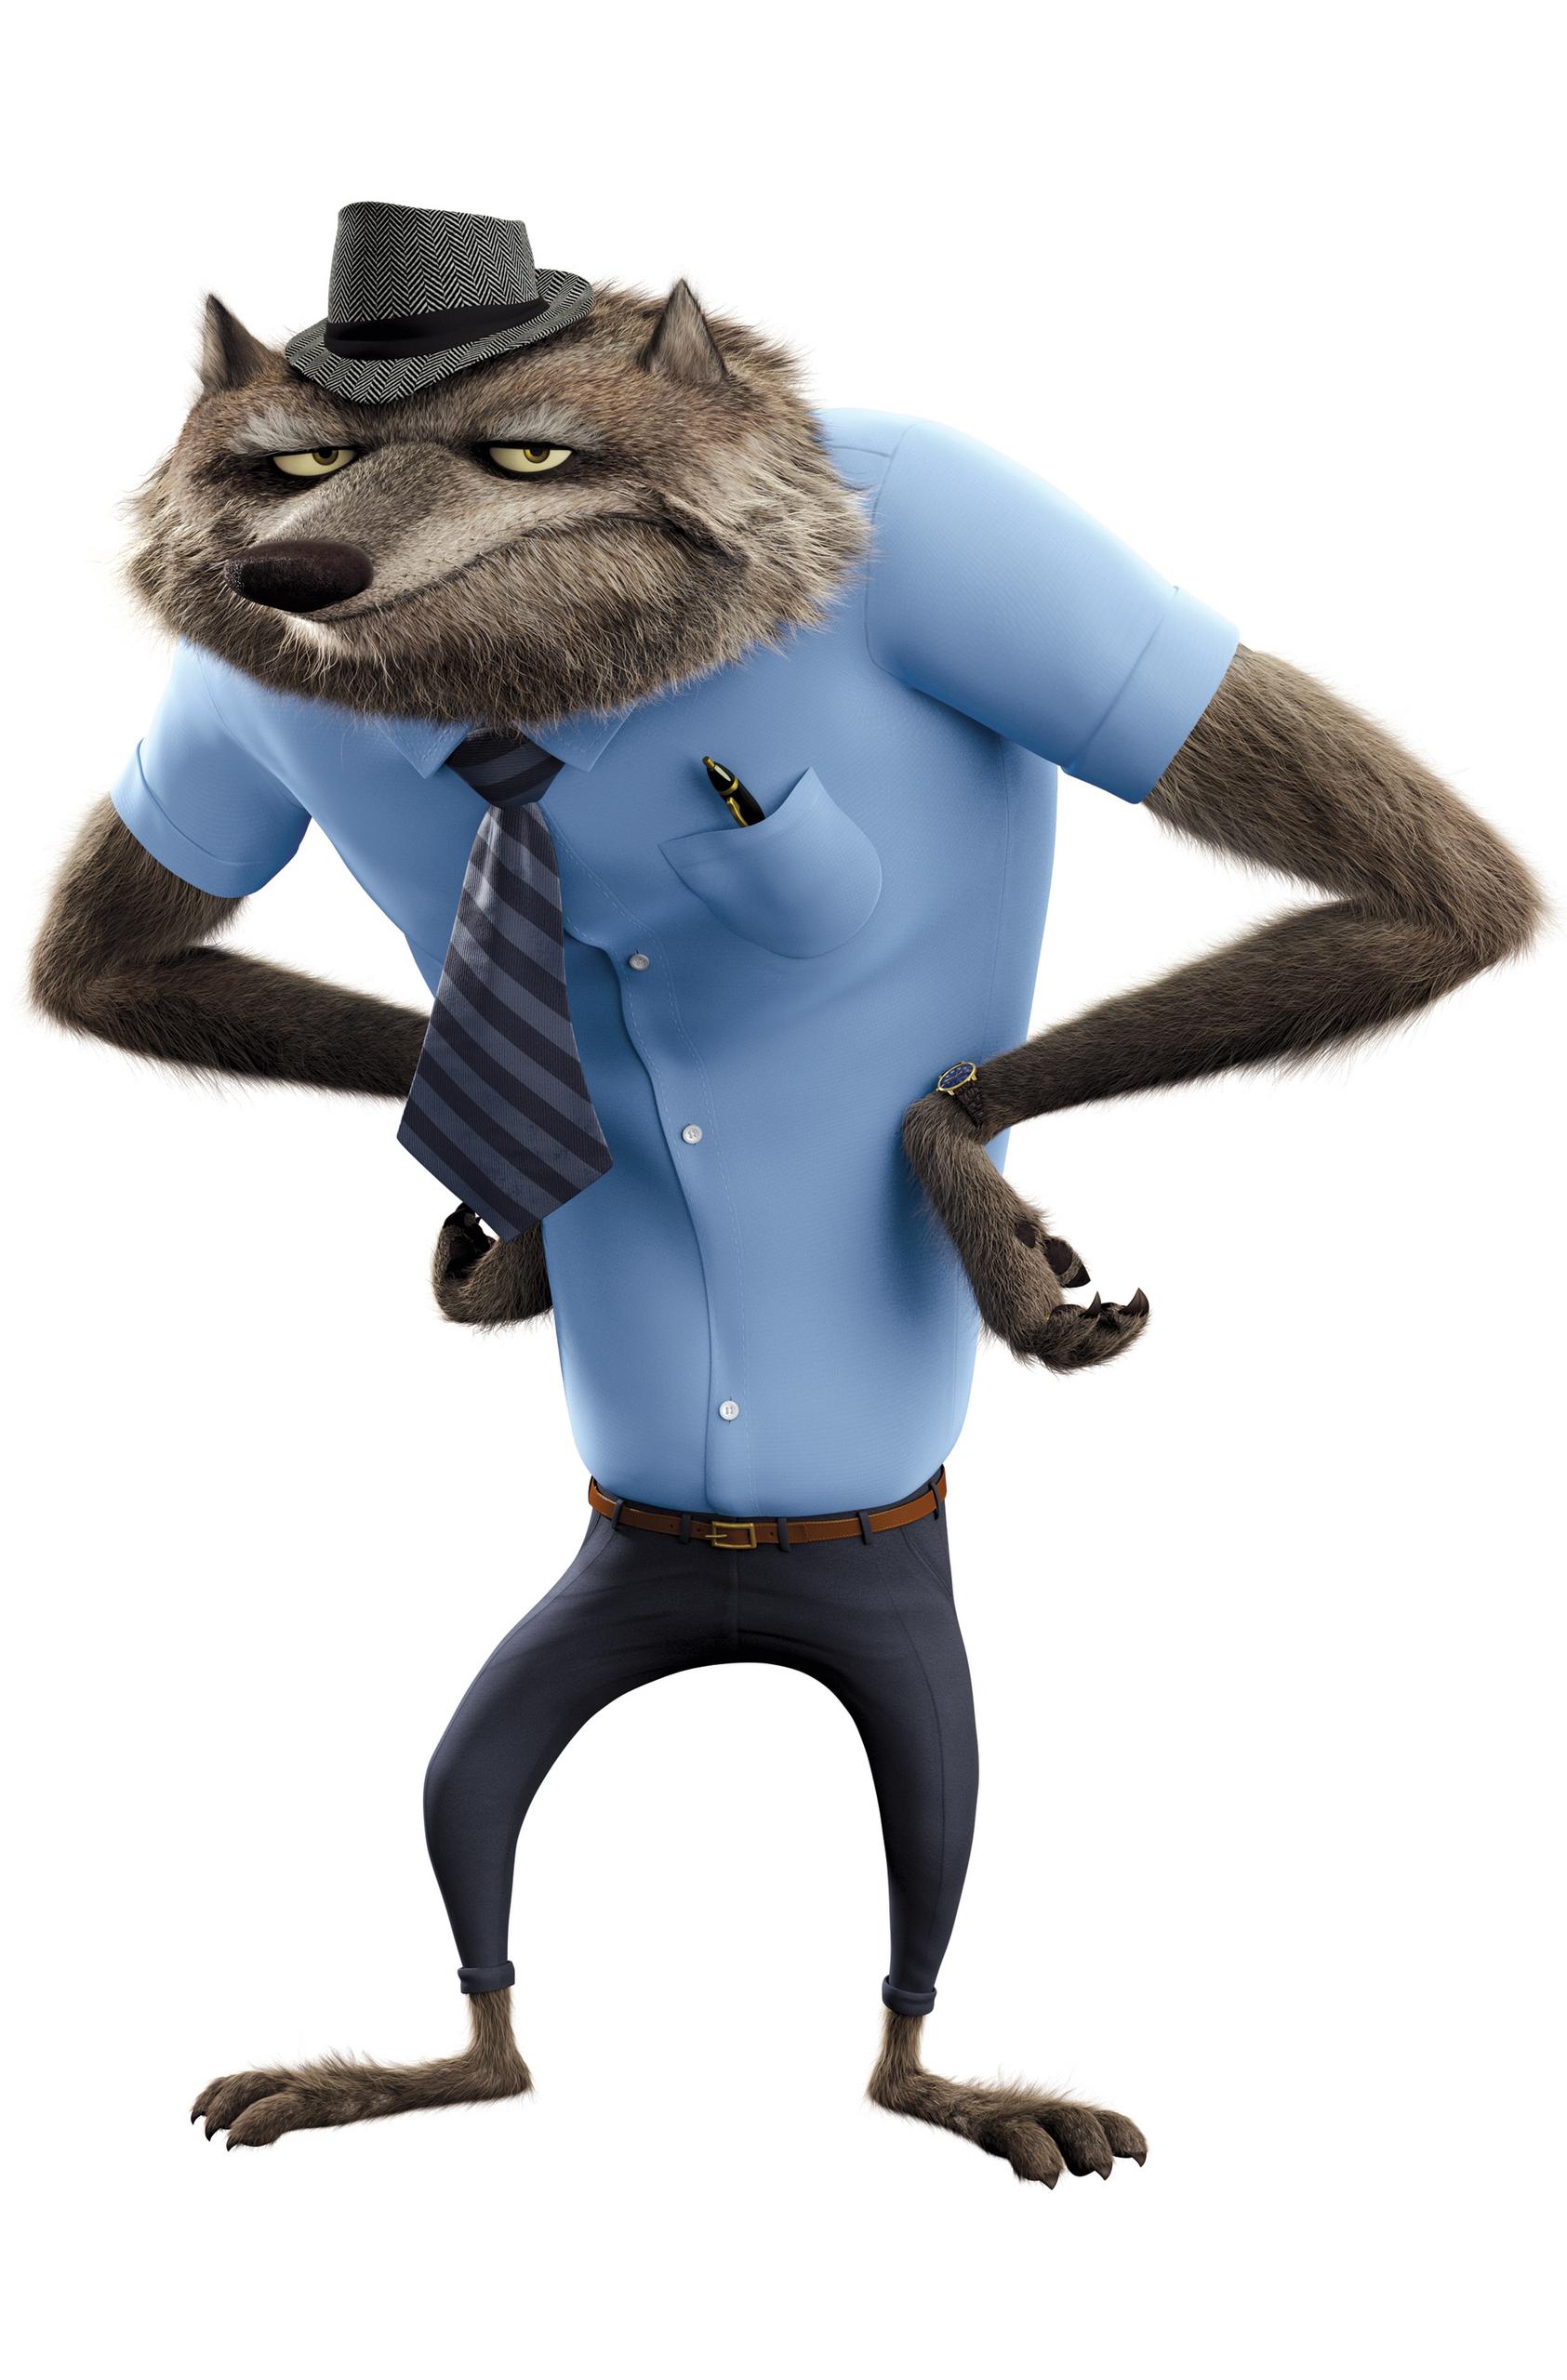 The Waynebob Werewolfpants Movie